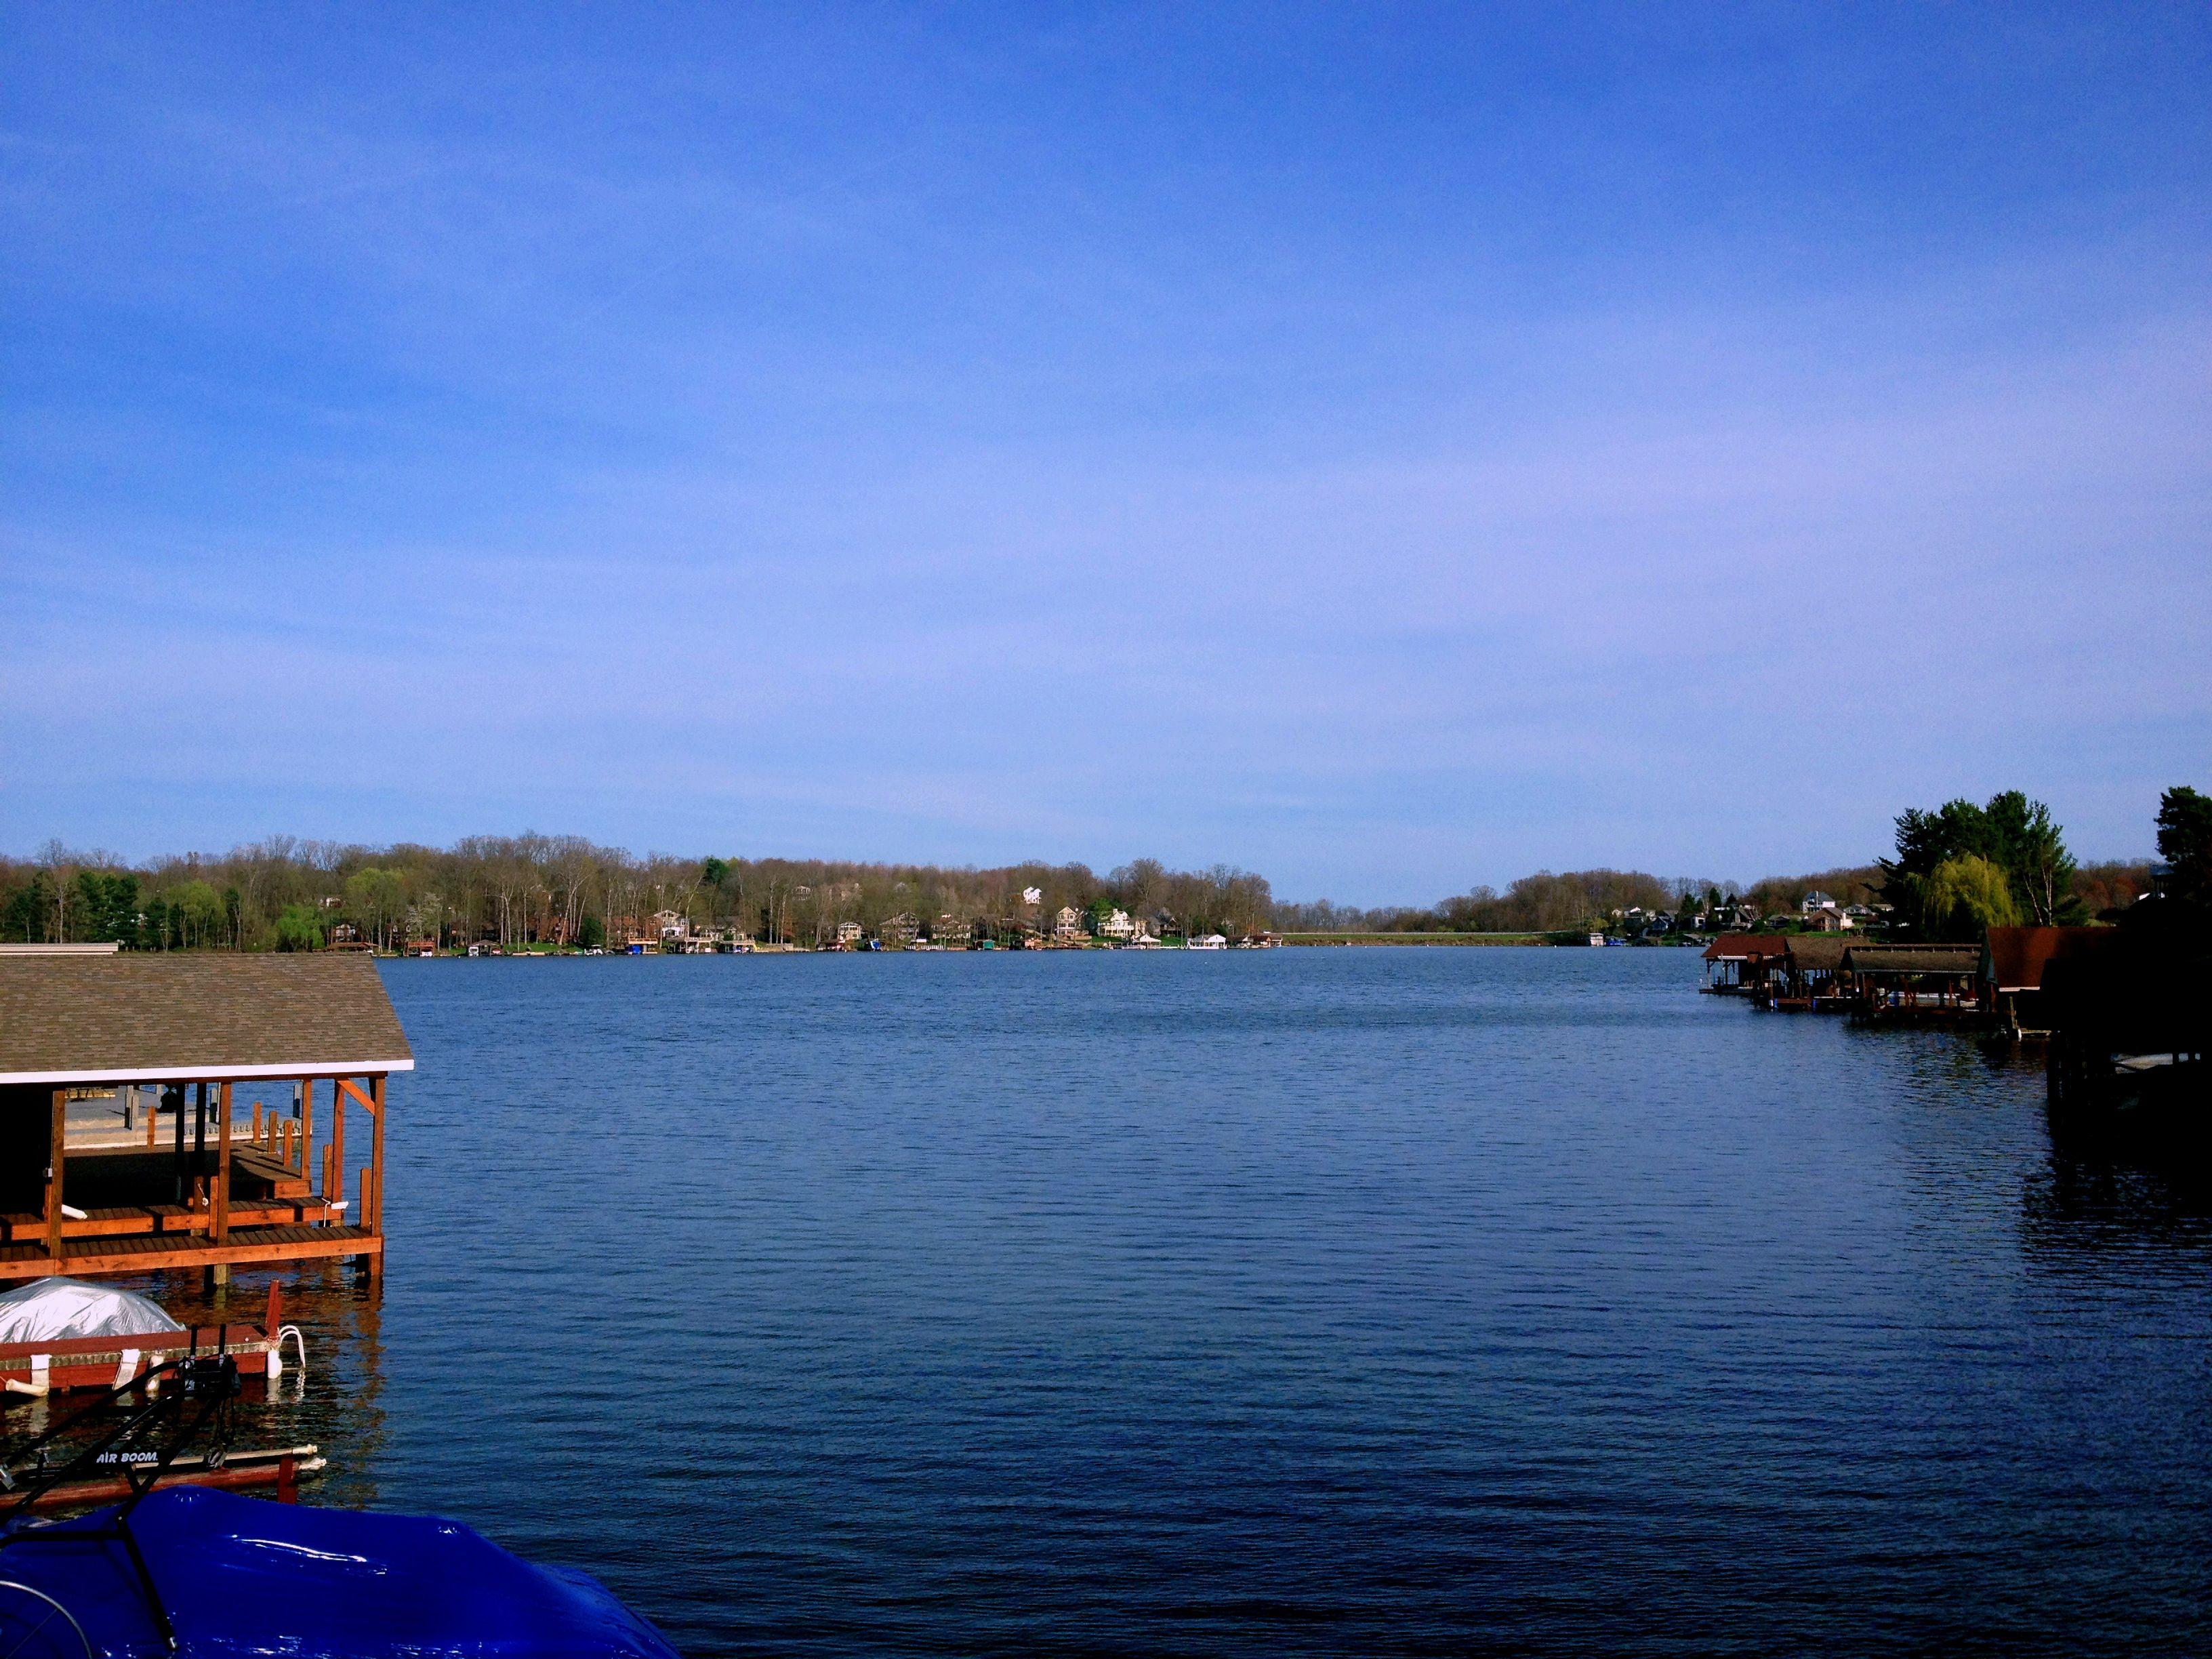 A day on the lake #AppleValleyLake #KnoxCountyOhio